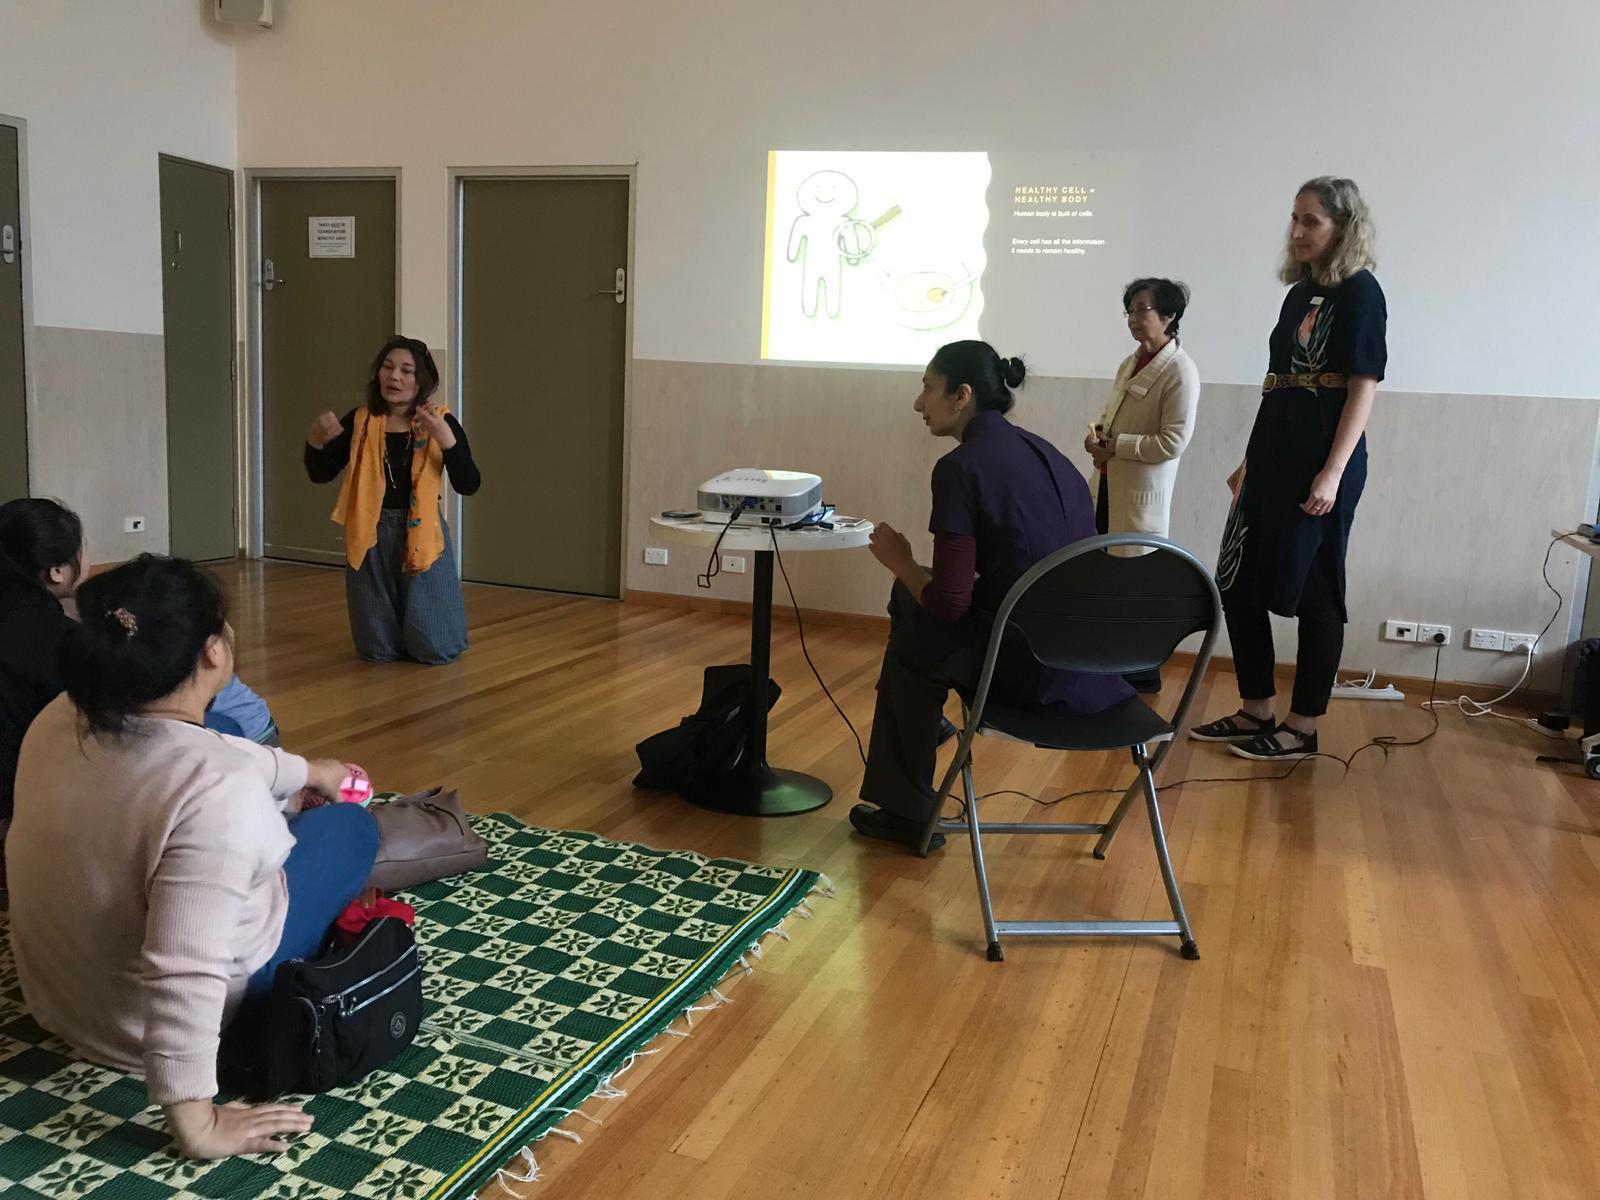 Divine Mother and Child Health Program - Melbourne